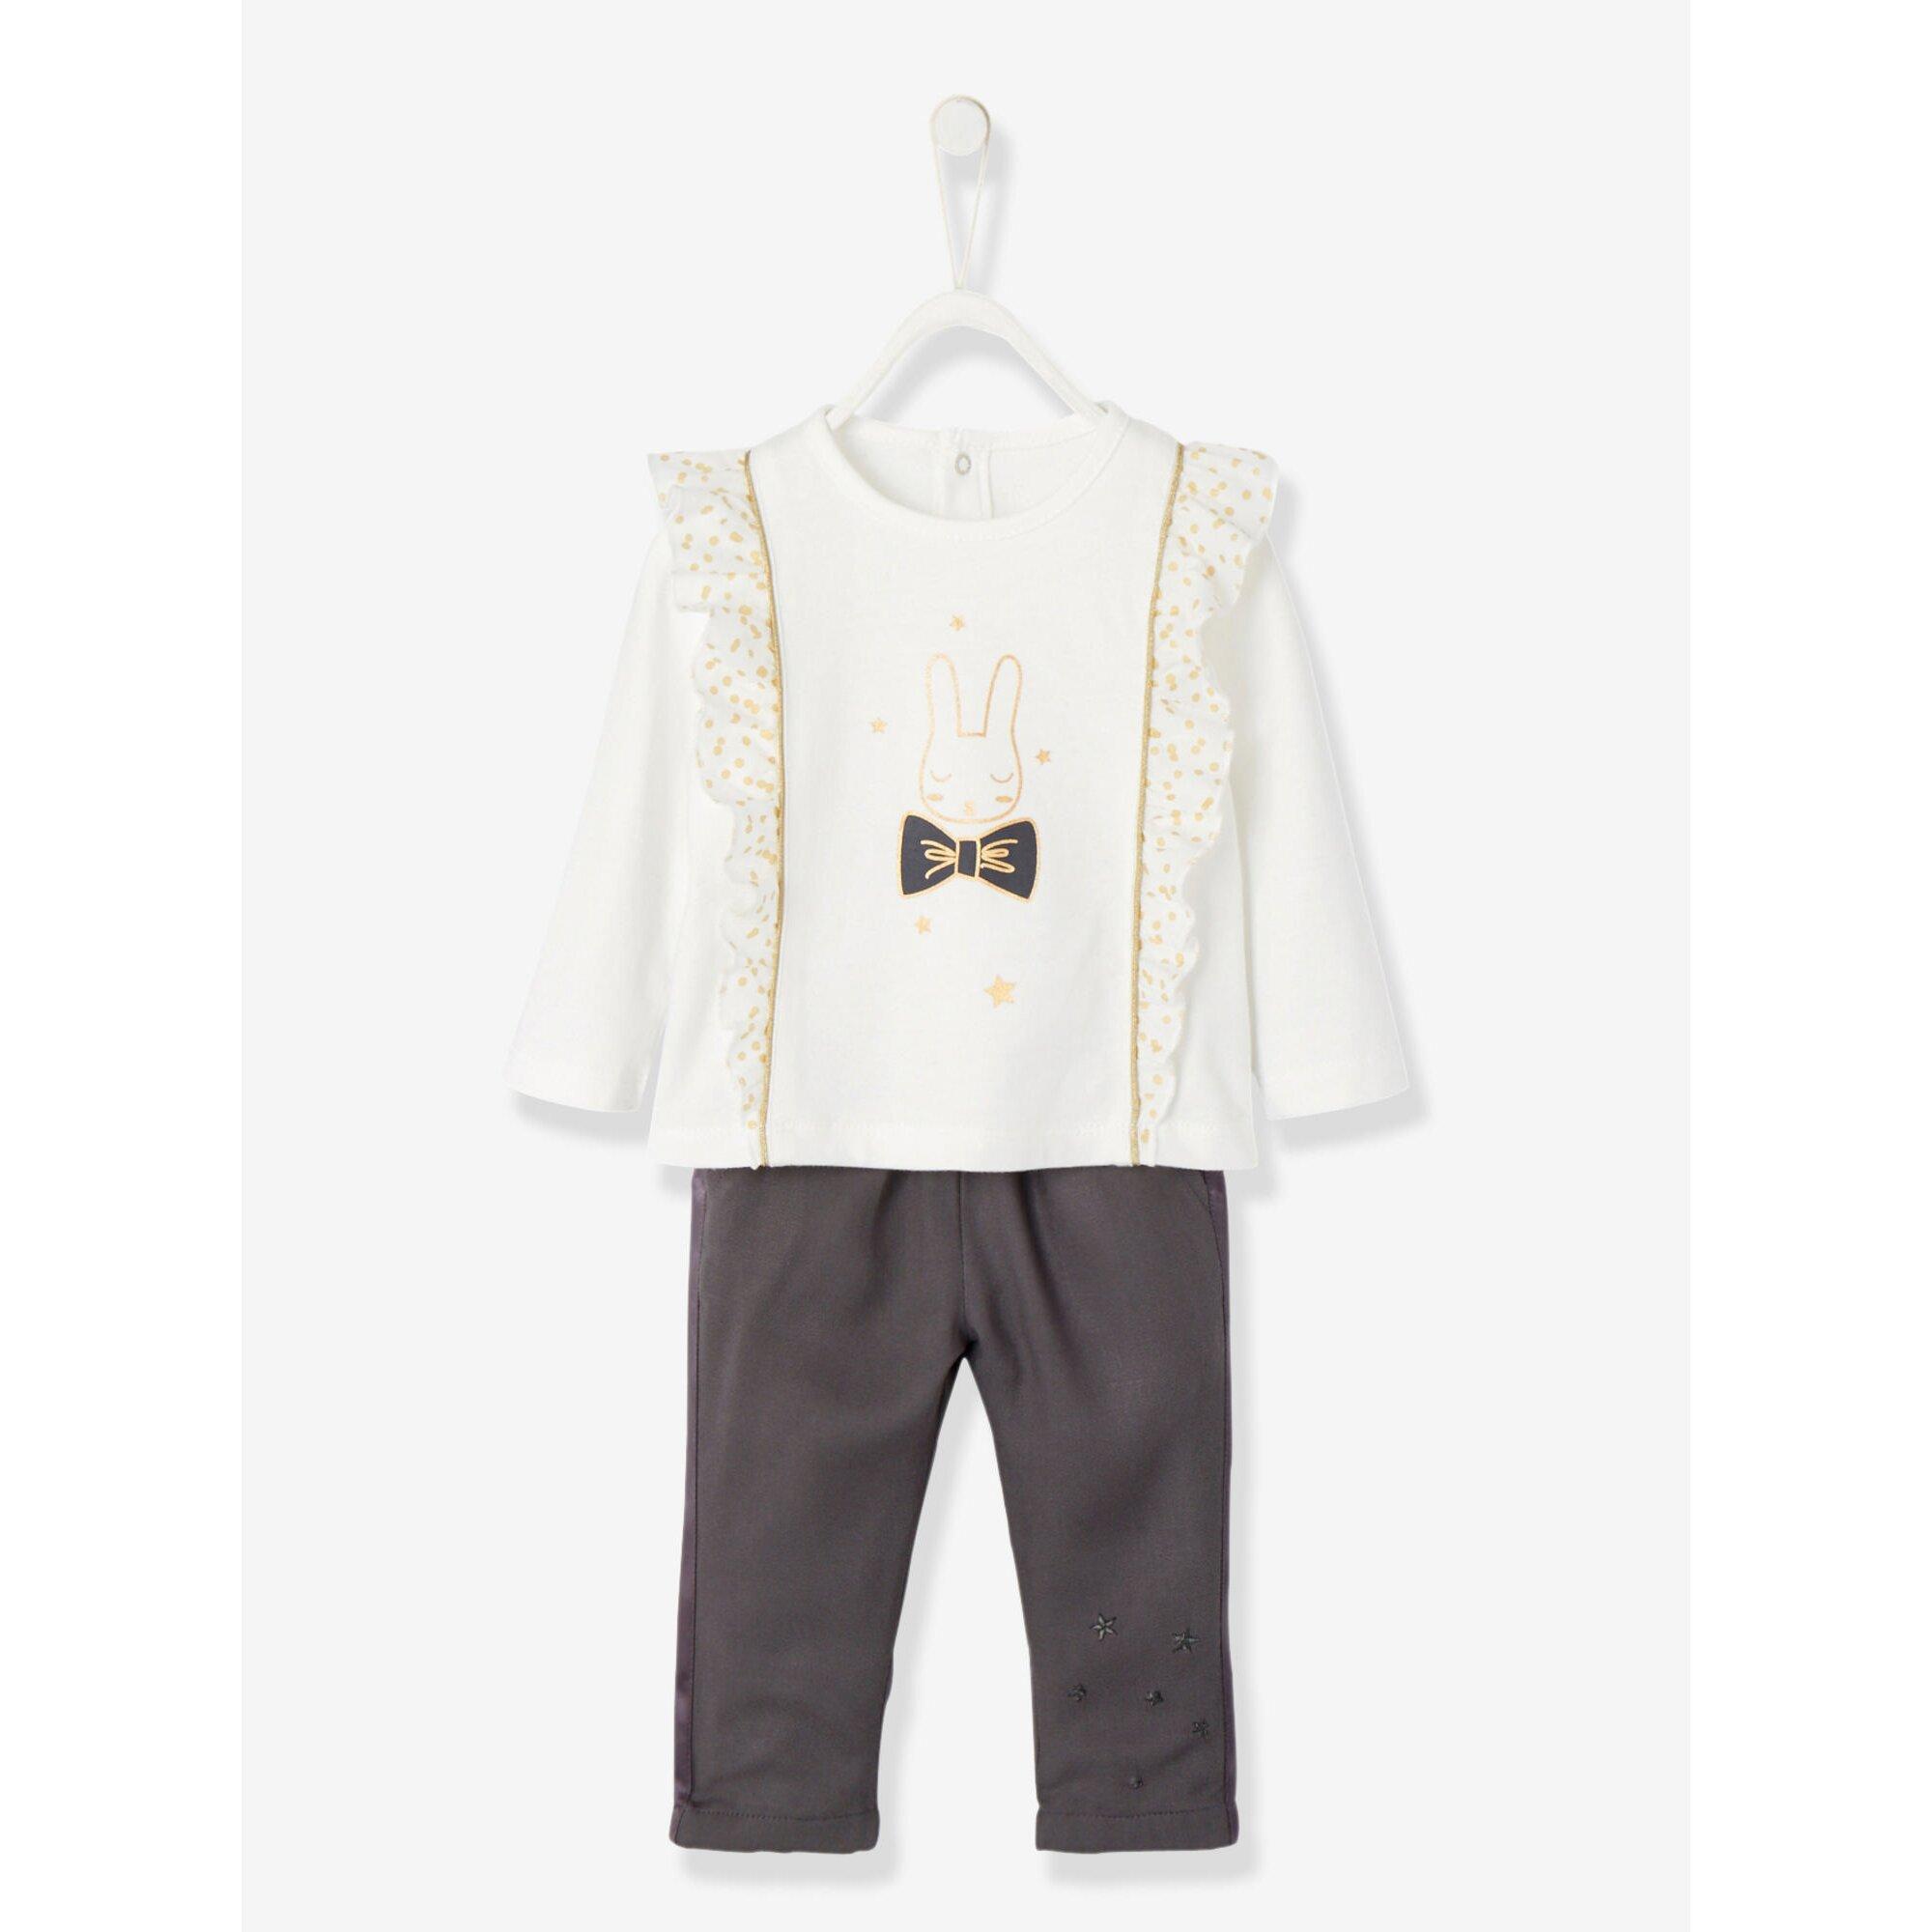 vertbaudet-set-aus-bluse-und-hose-fur-baby-madchen, 30.99 EUR @ babywalz-de